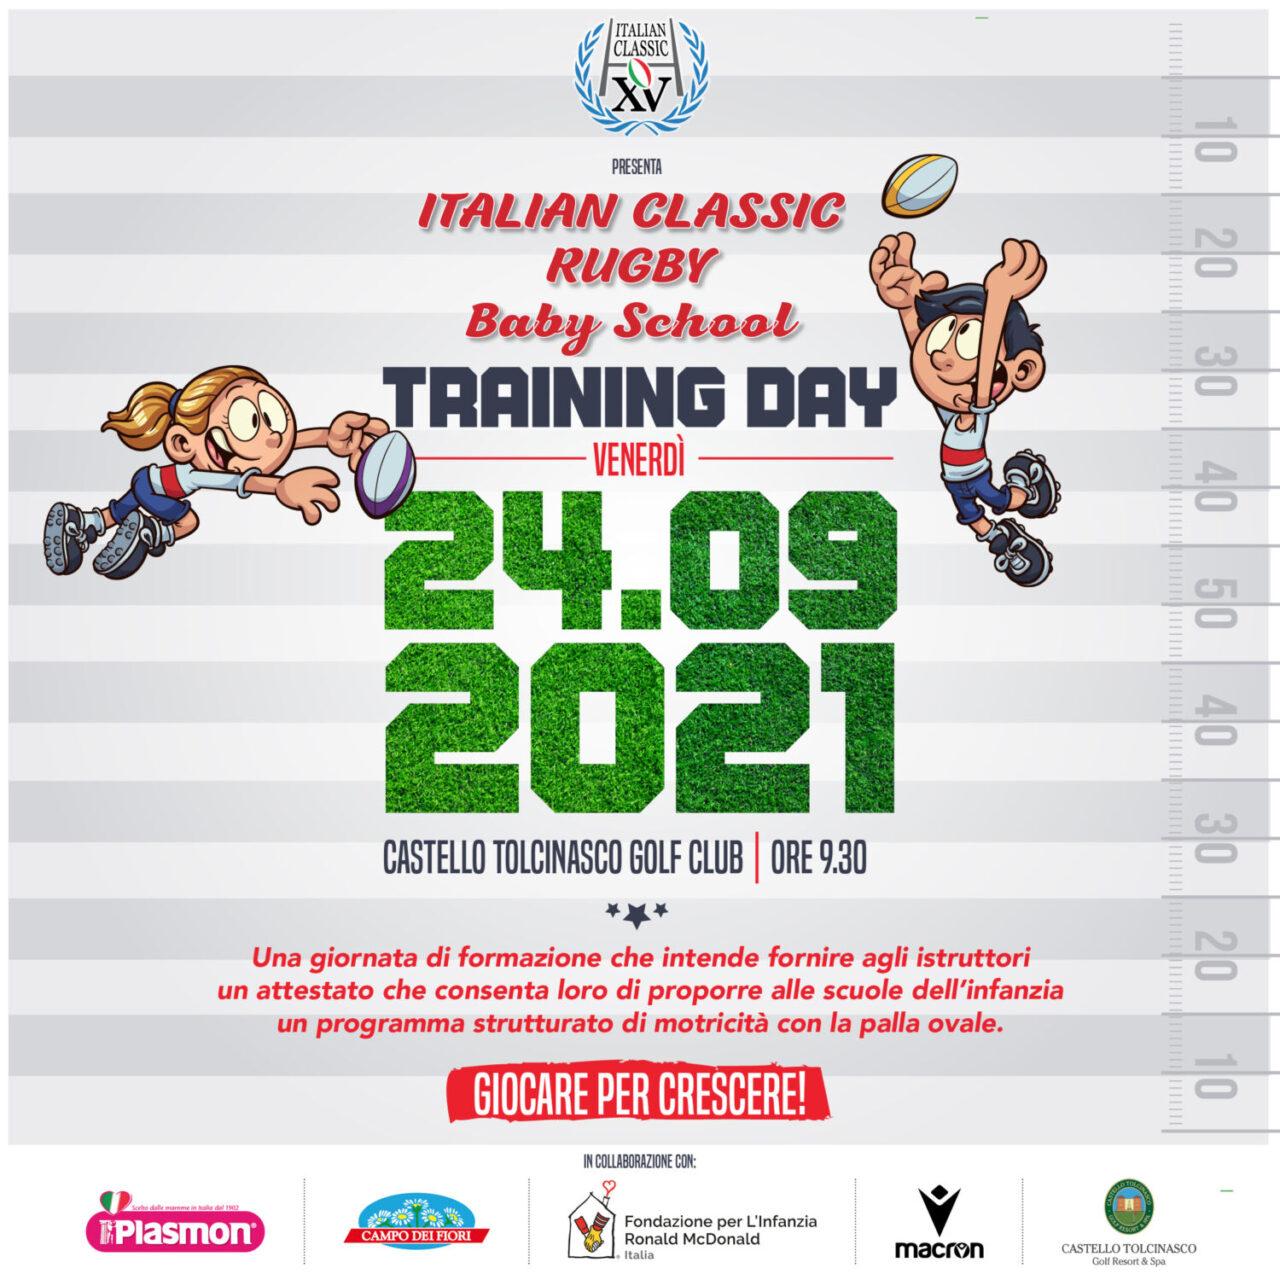 https://www.rugbyitalianclassicxv.com/wp-content/uploads/2021/08/locandina-1080x1080-1-1280x1280.jpg